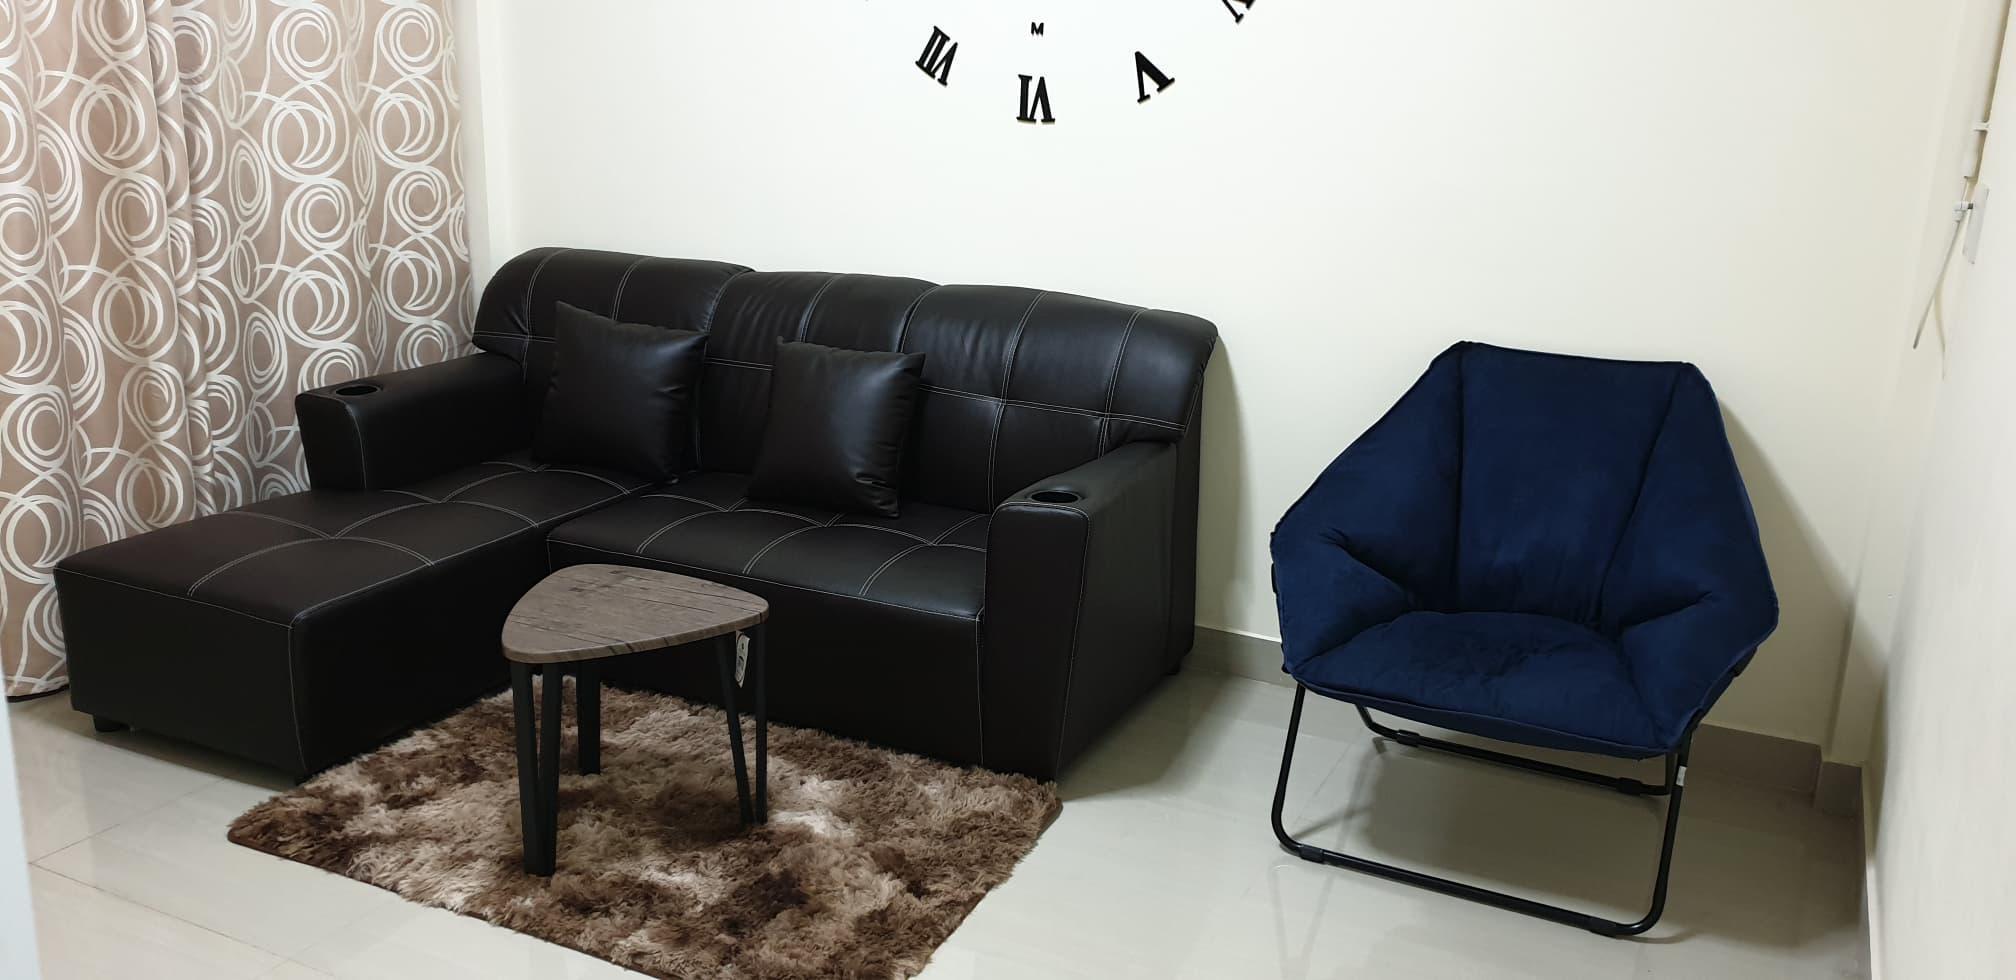 Amphawa Guest House